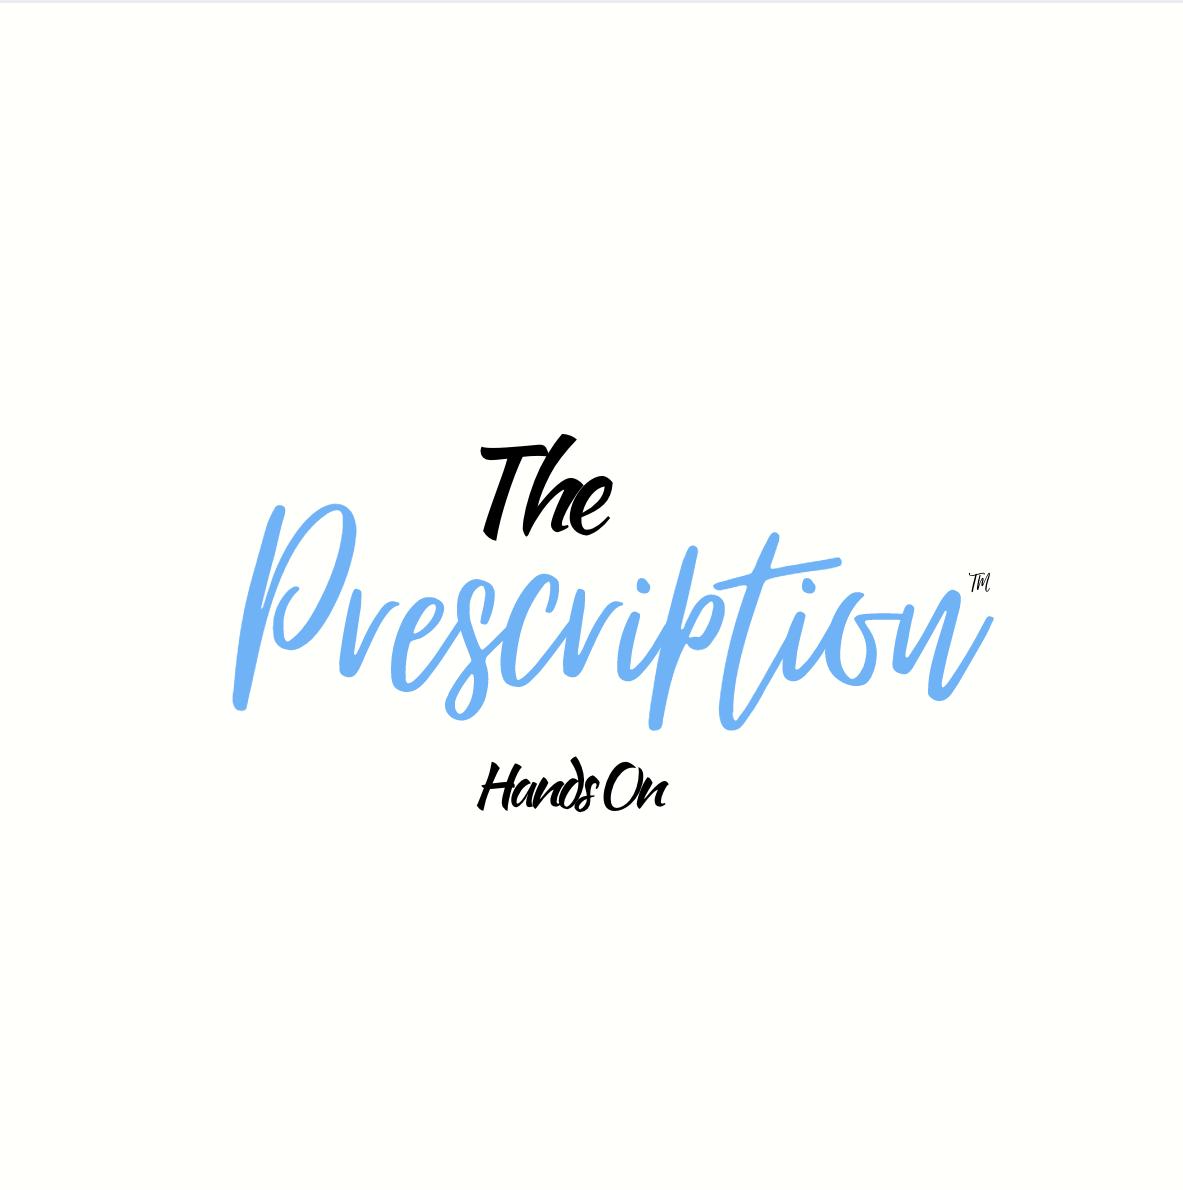 The Prescription - Hands On